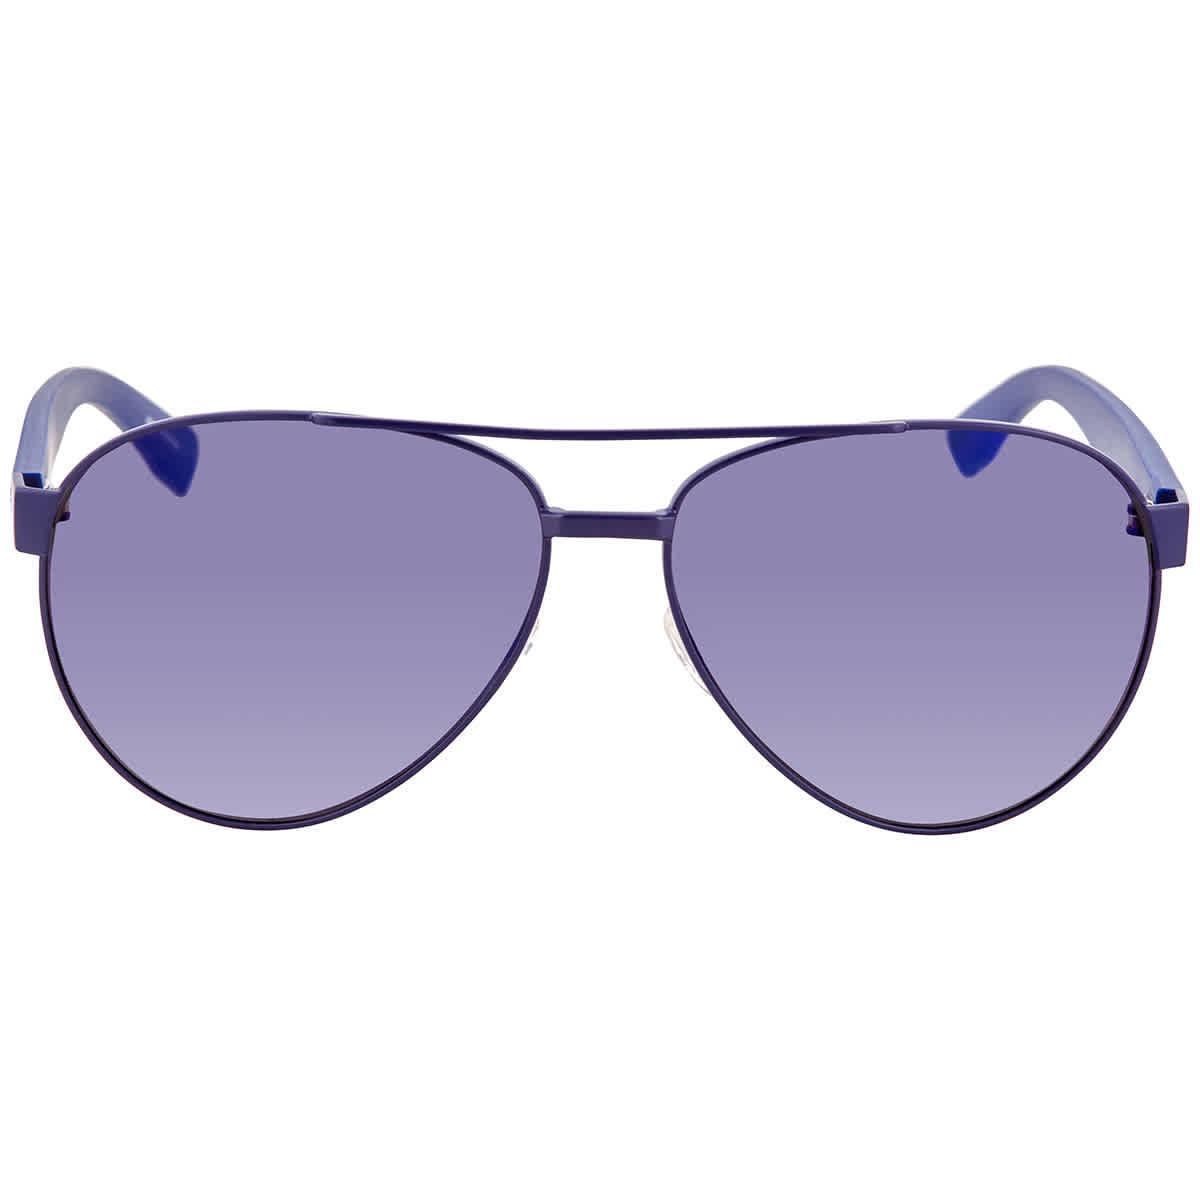 Lacoste Purple Aviator Unisex Sunglasses L185s 424 60 In Blue